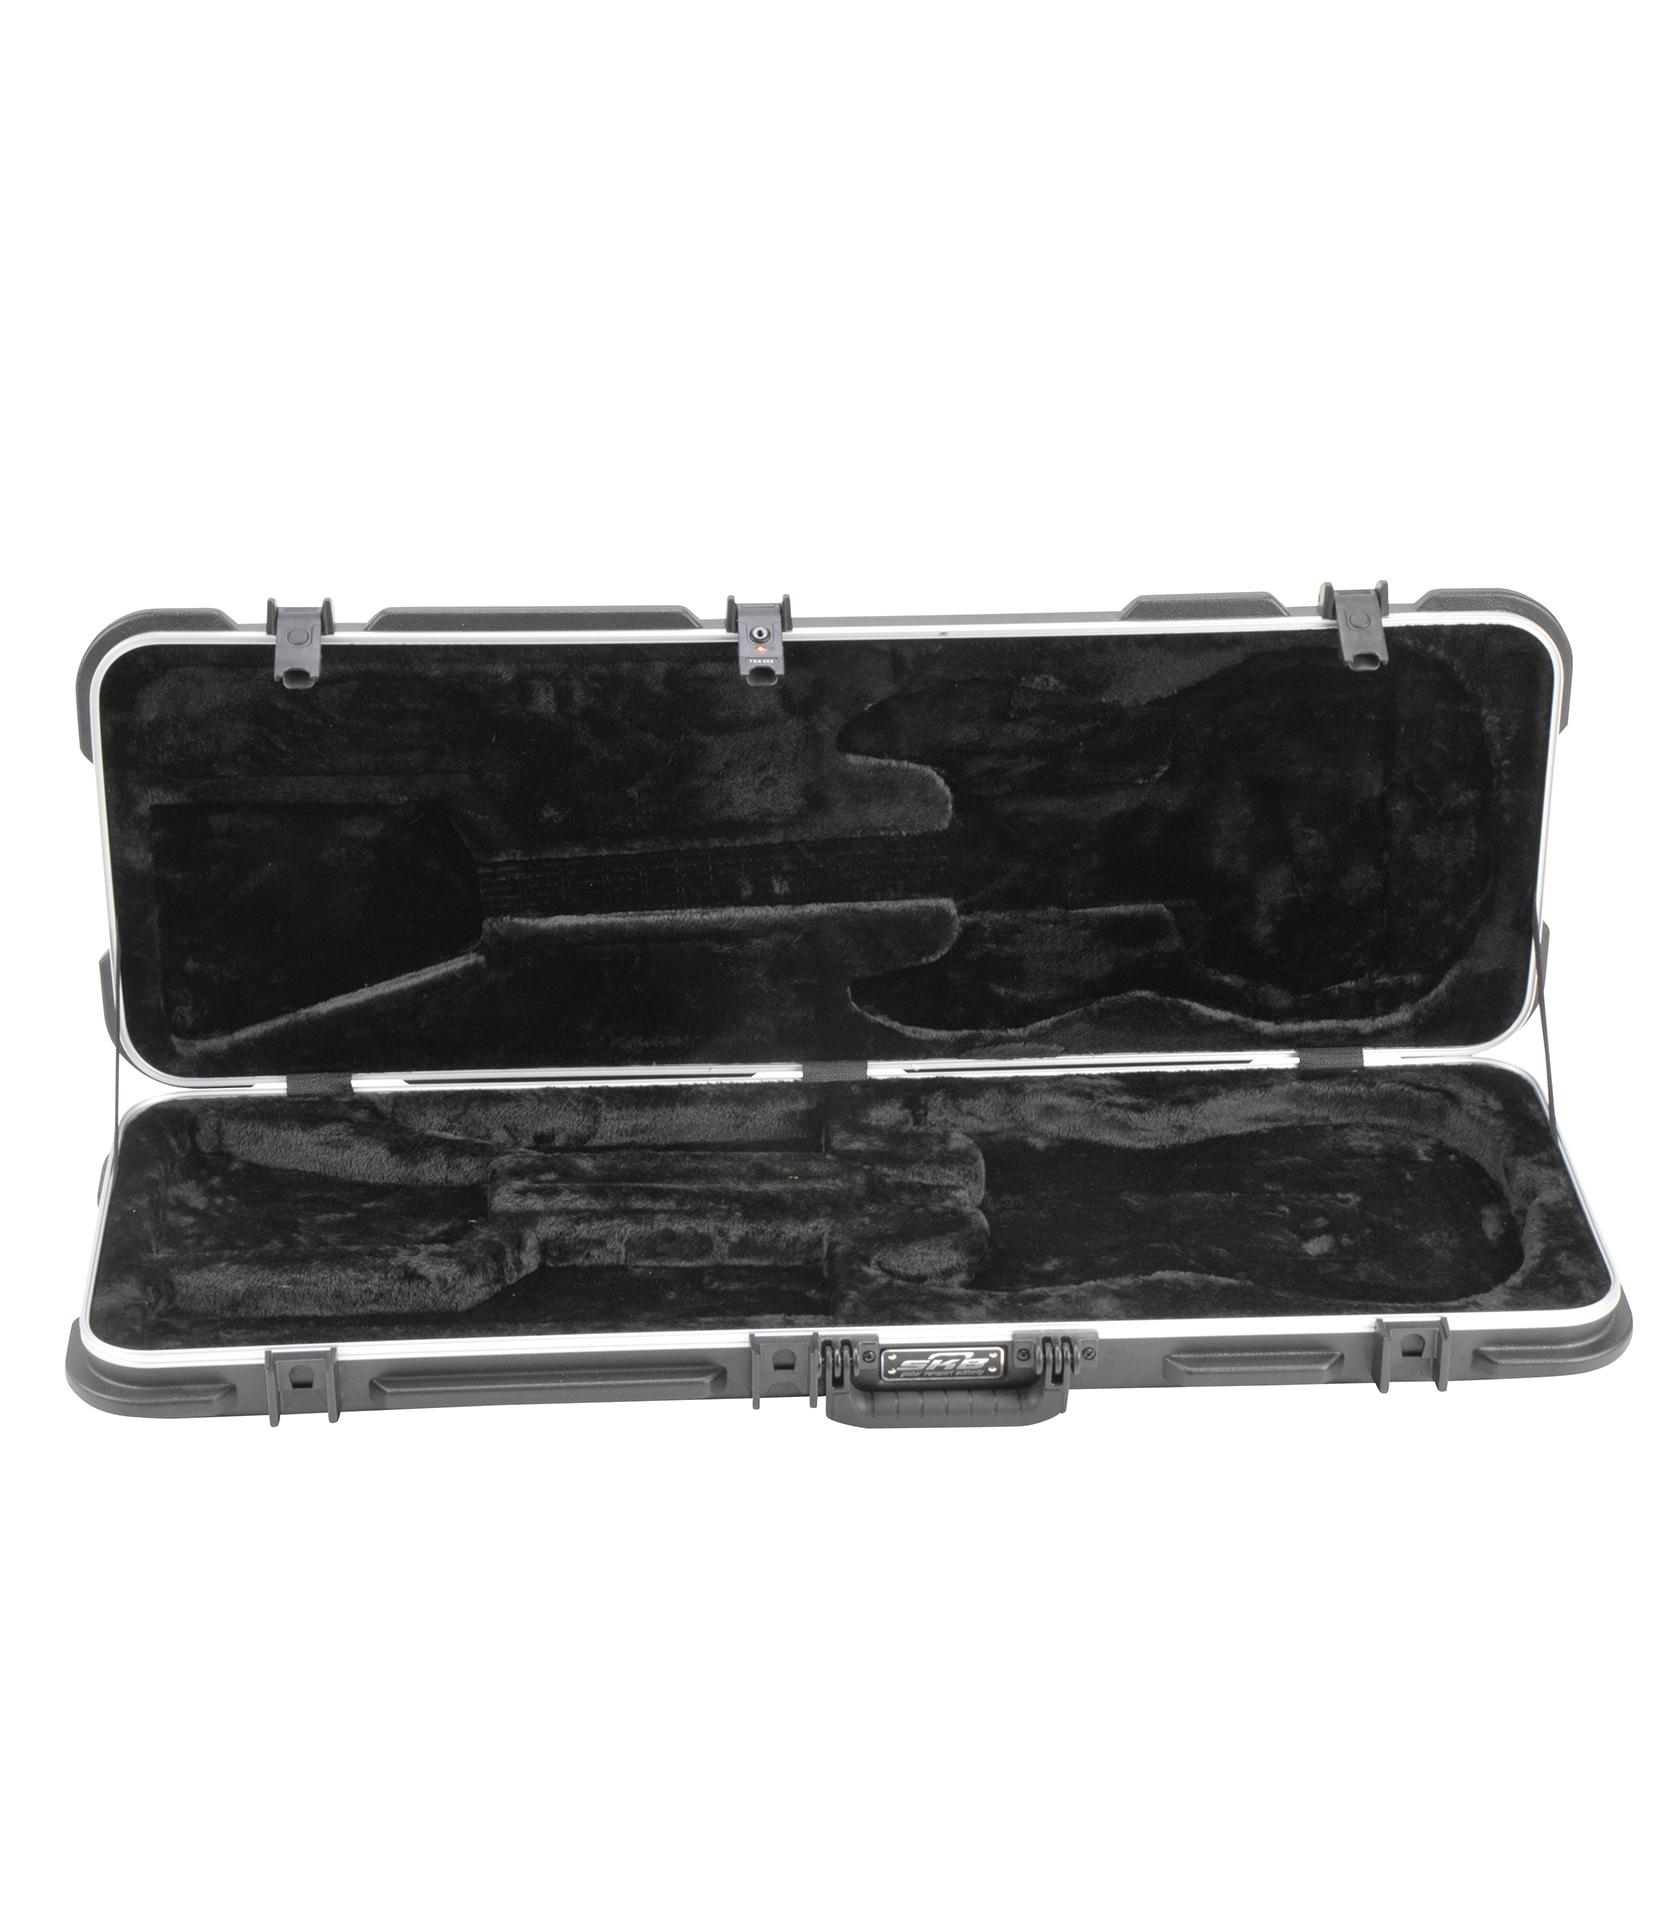 Melody House Musical Instruments Store - 1SKB 66 Electric Rectangular HardshellTSA Latc